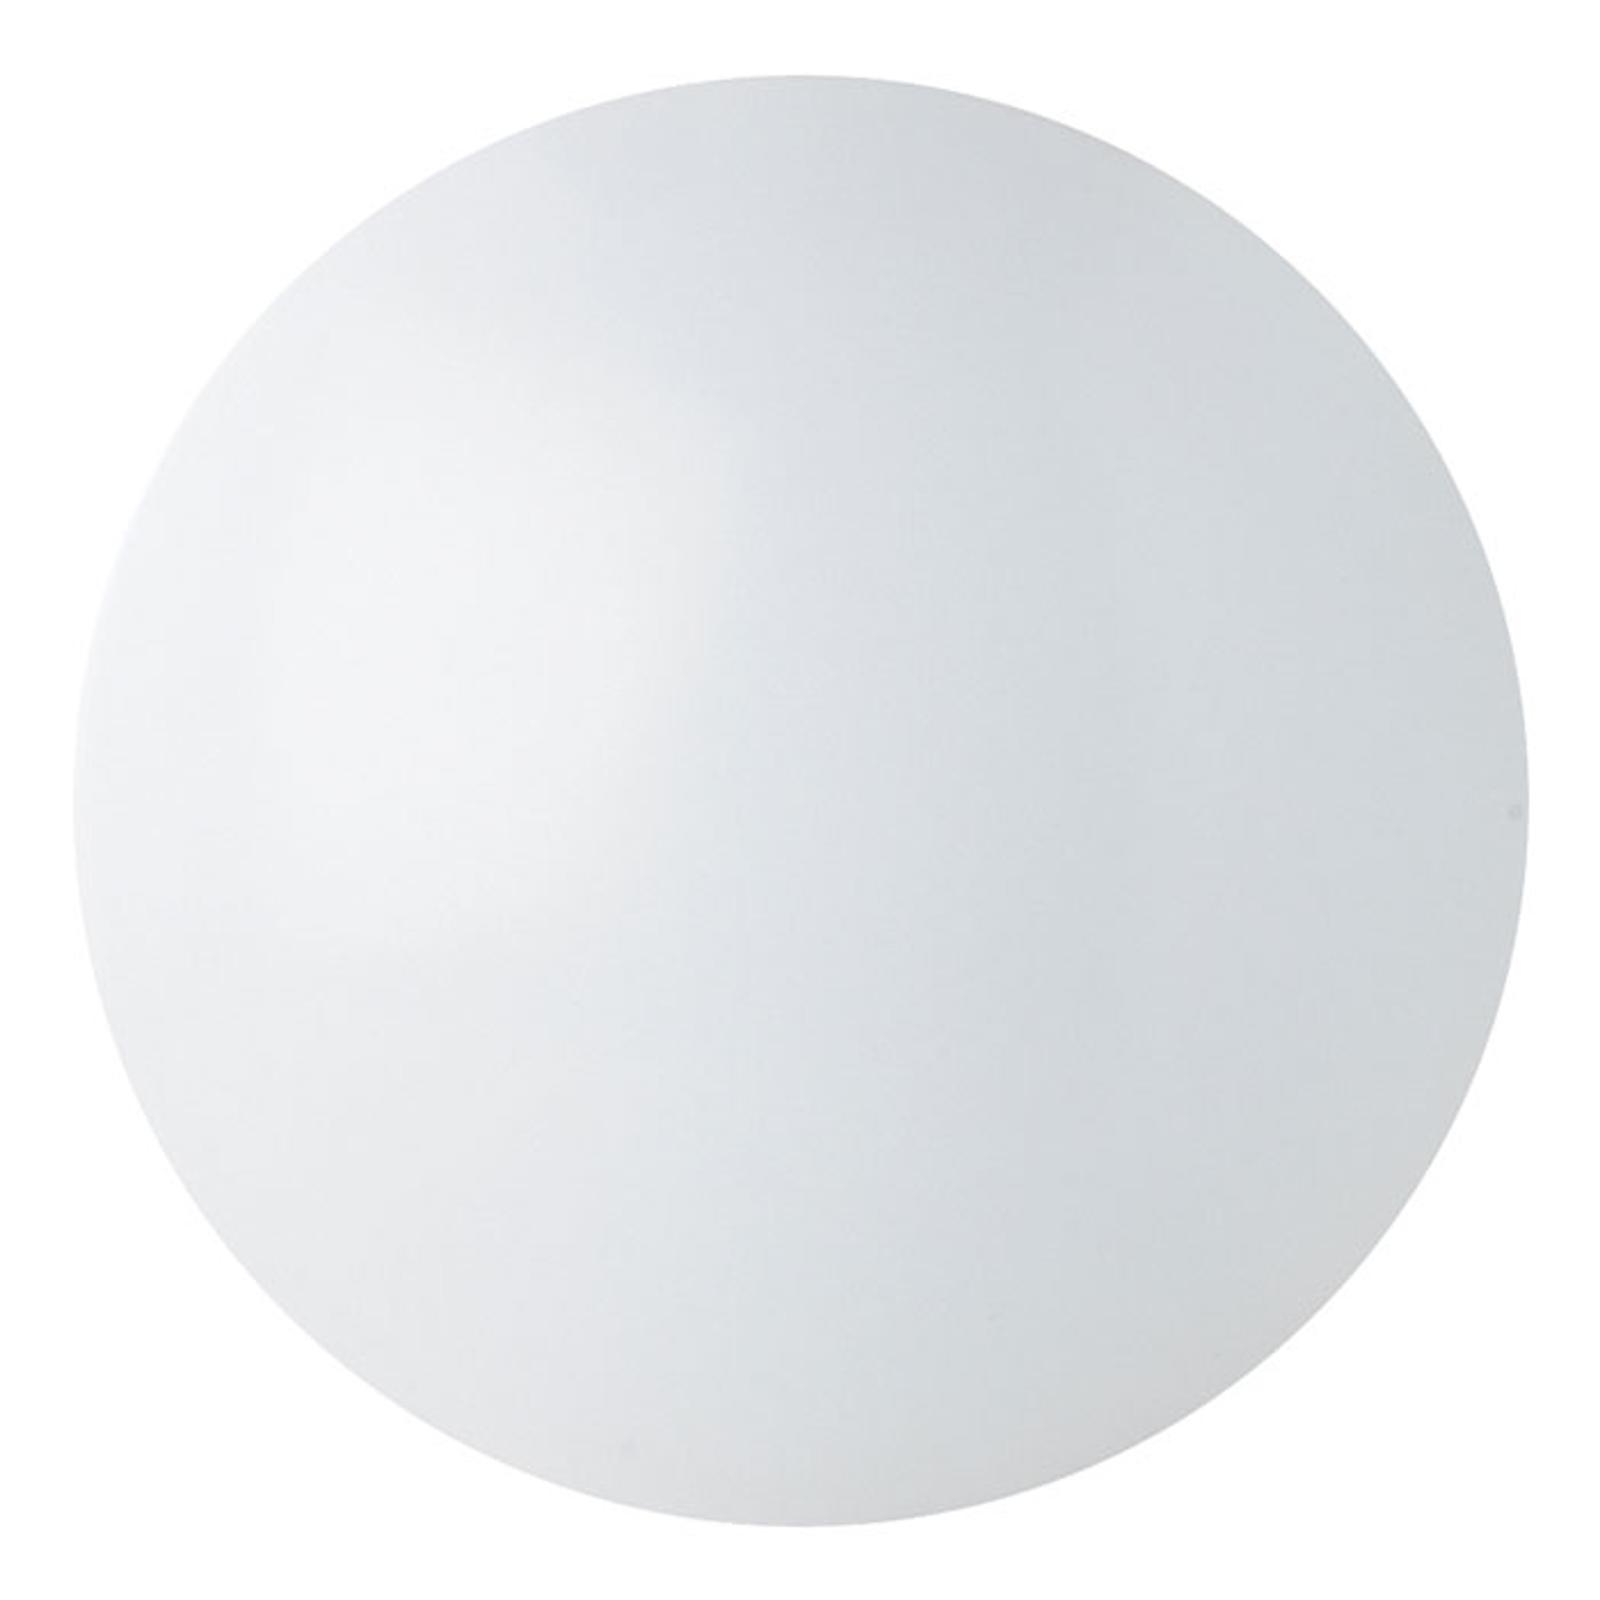 Renzo - ronde led-plafondlamp IP44, warmwit